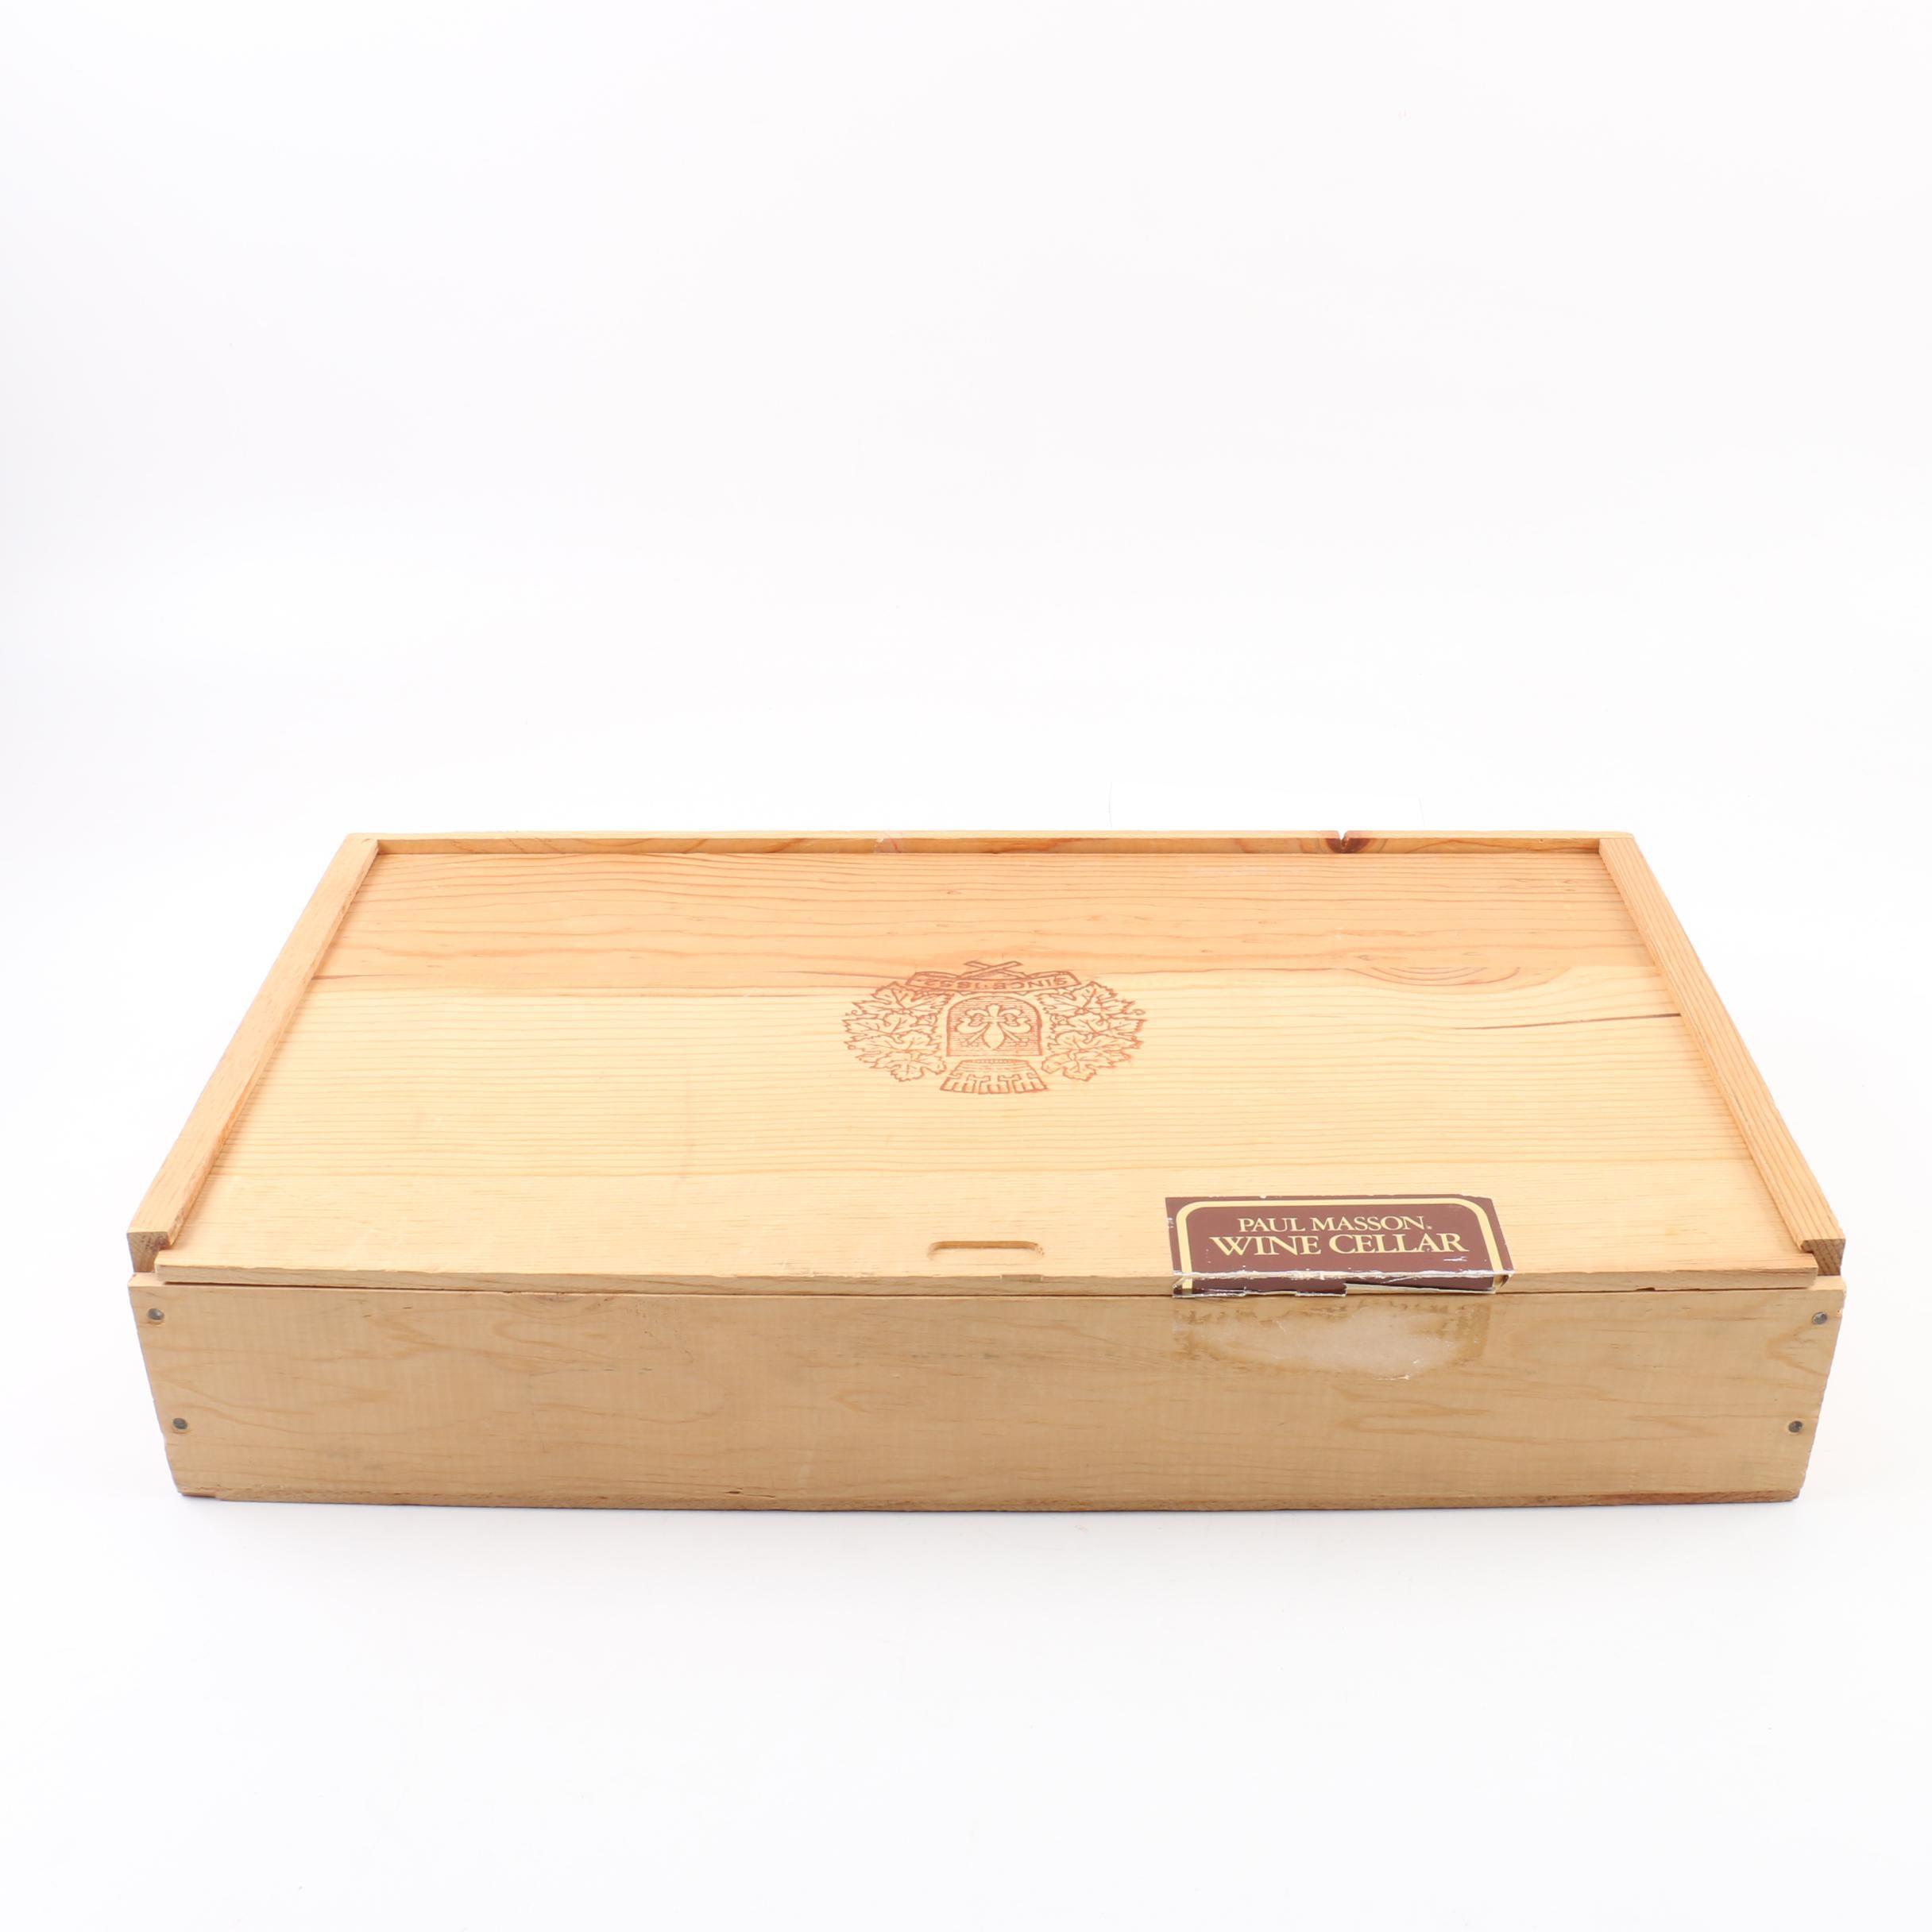 Paul Masson Wood Box